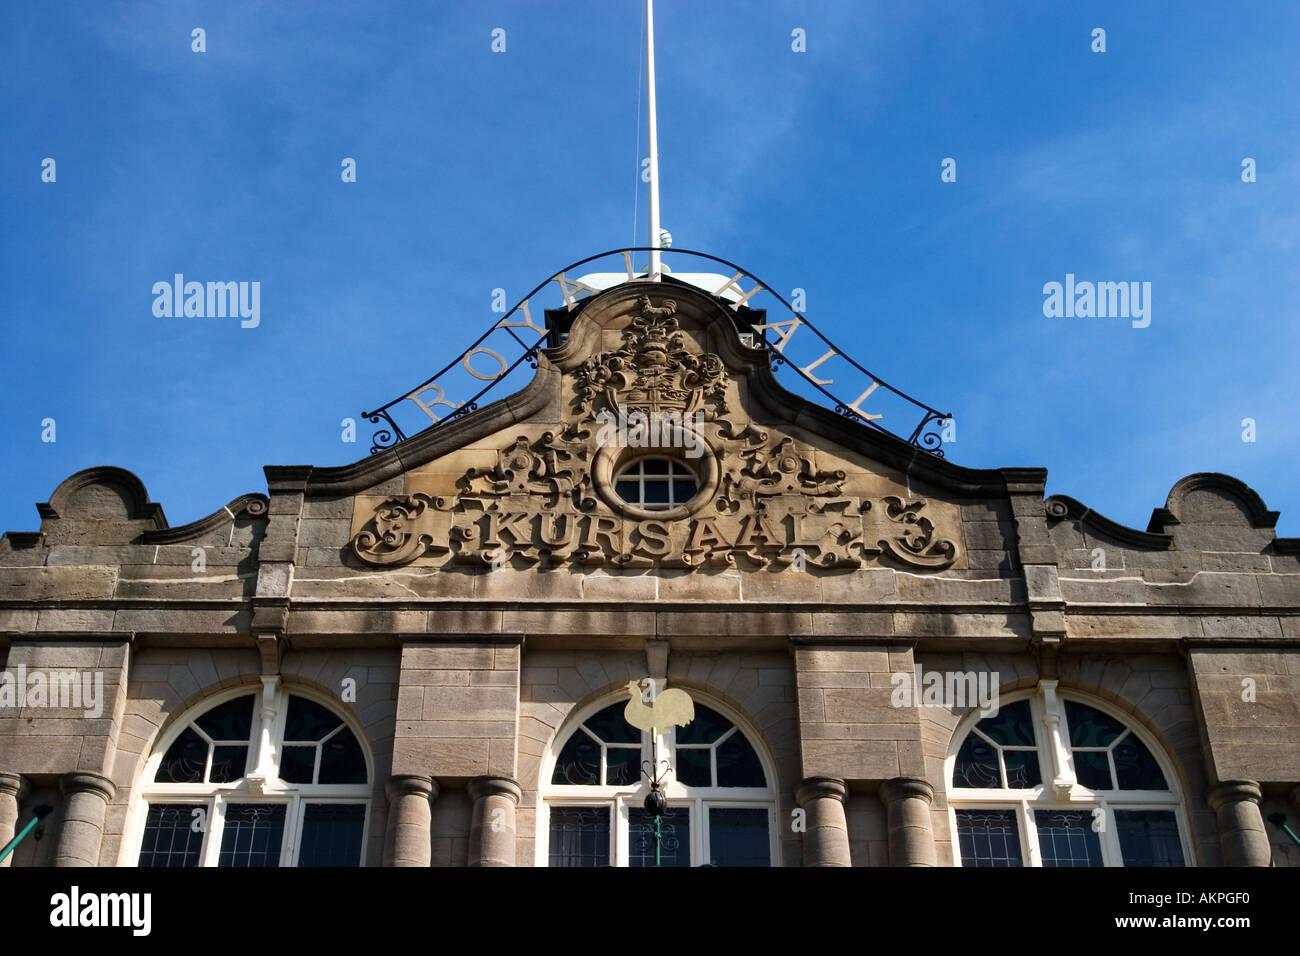 Harrogate Royal Hall or Kursaal 1903 by Frank Matcham and his architect Arthur Beale North Yorkshire England - Stock Image